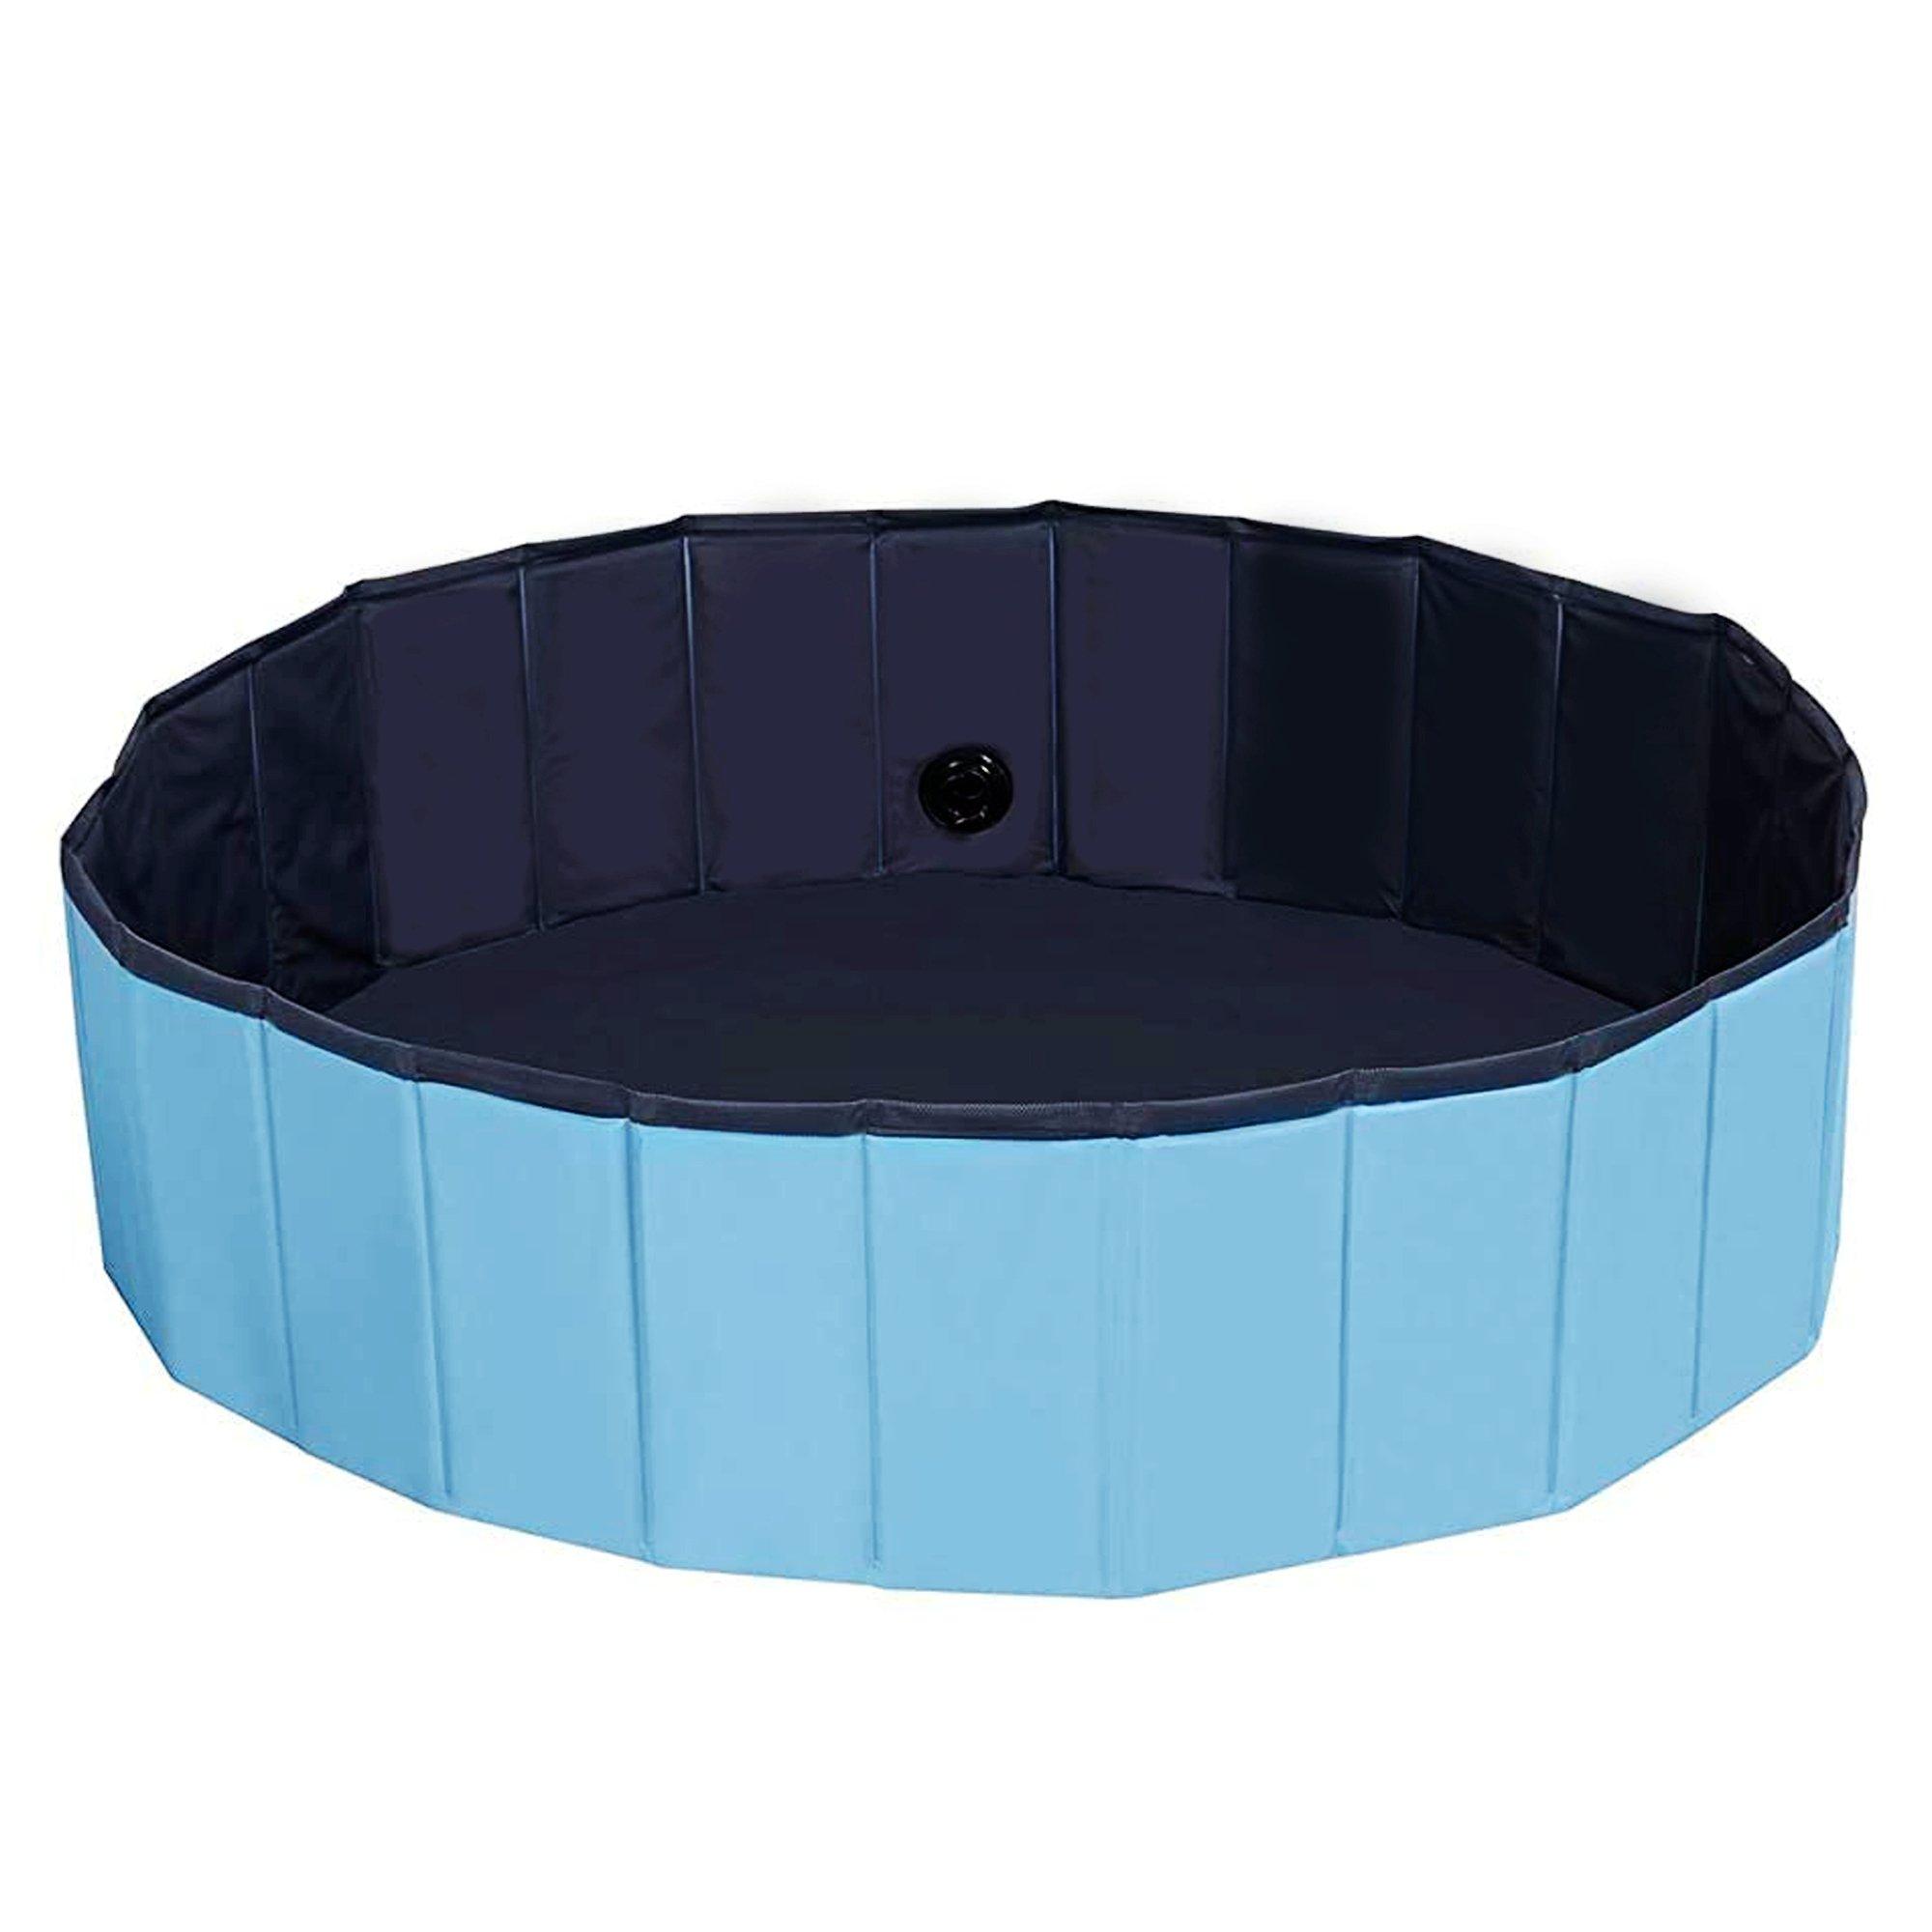 Foldable Pet Bathtub Potable Swimming